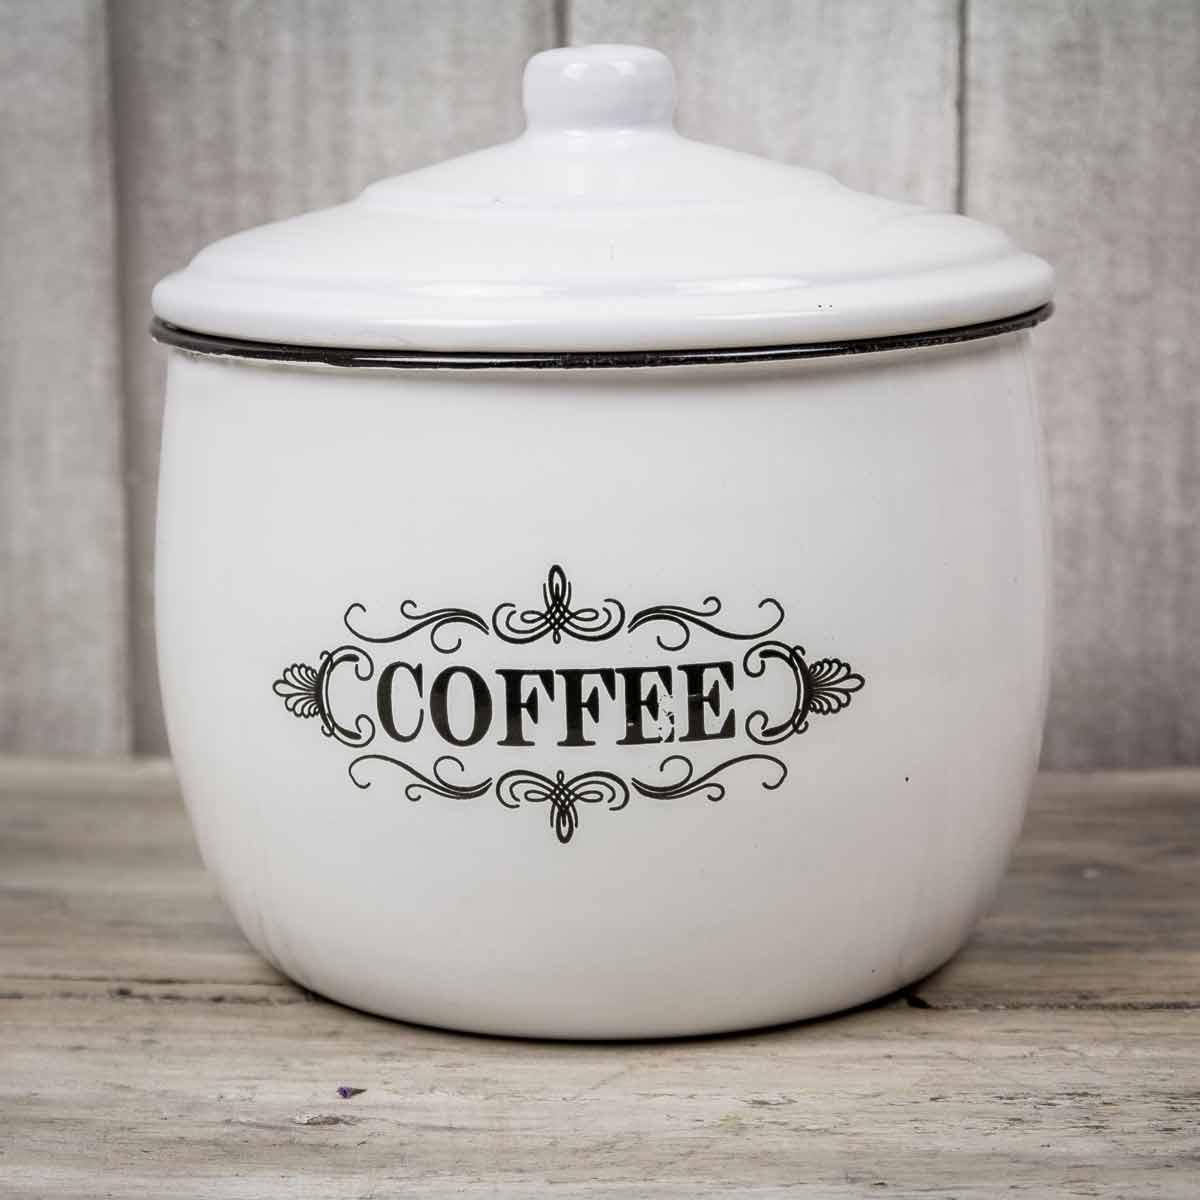 mrwonderful_potes_ceramica_blancos_coffe-tea_02